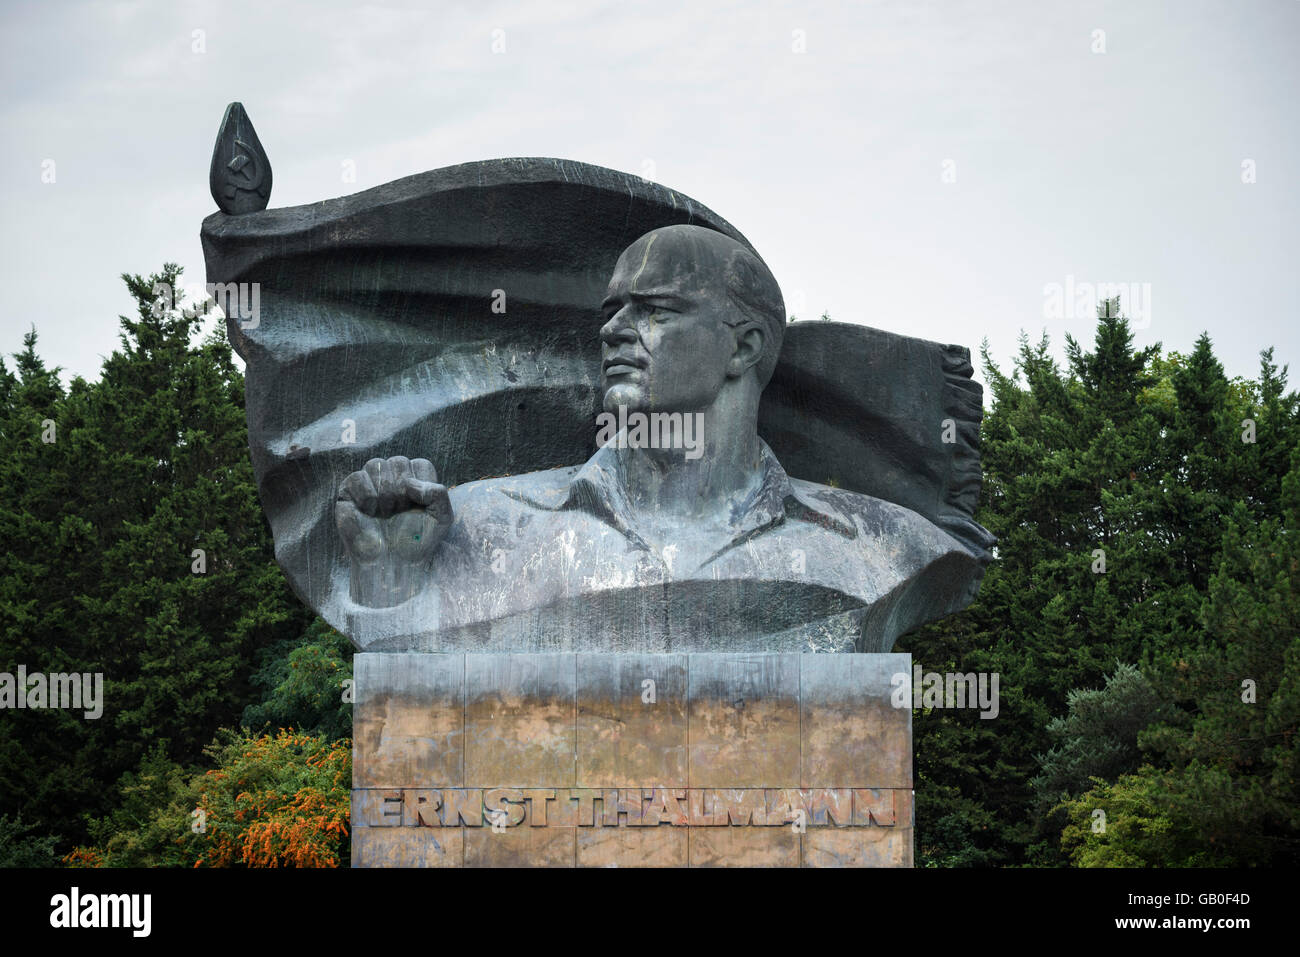 Berlin. Germany. Ernst Thälmann Monument in Prenzlauer Berg. - Stock Image